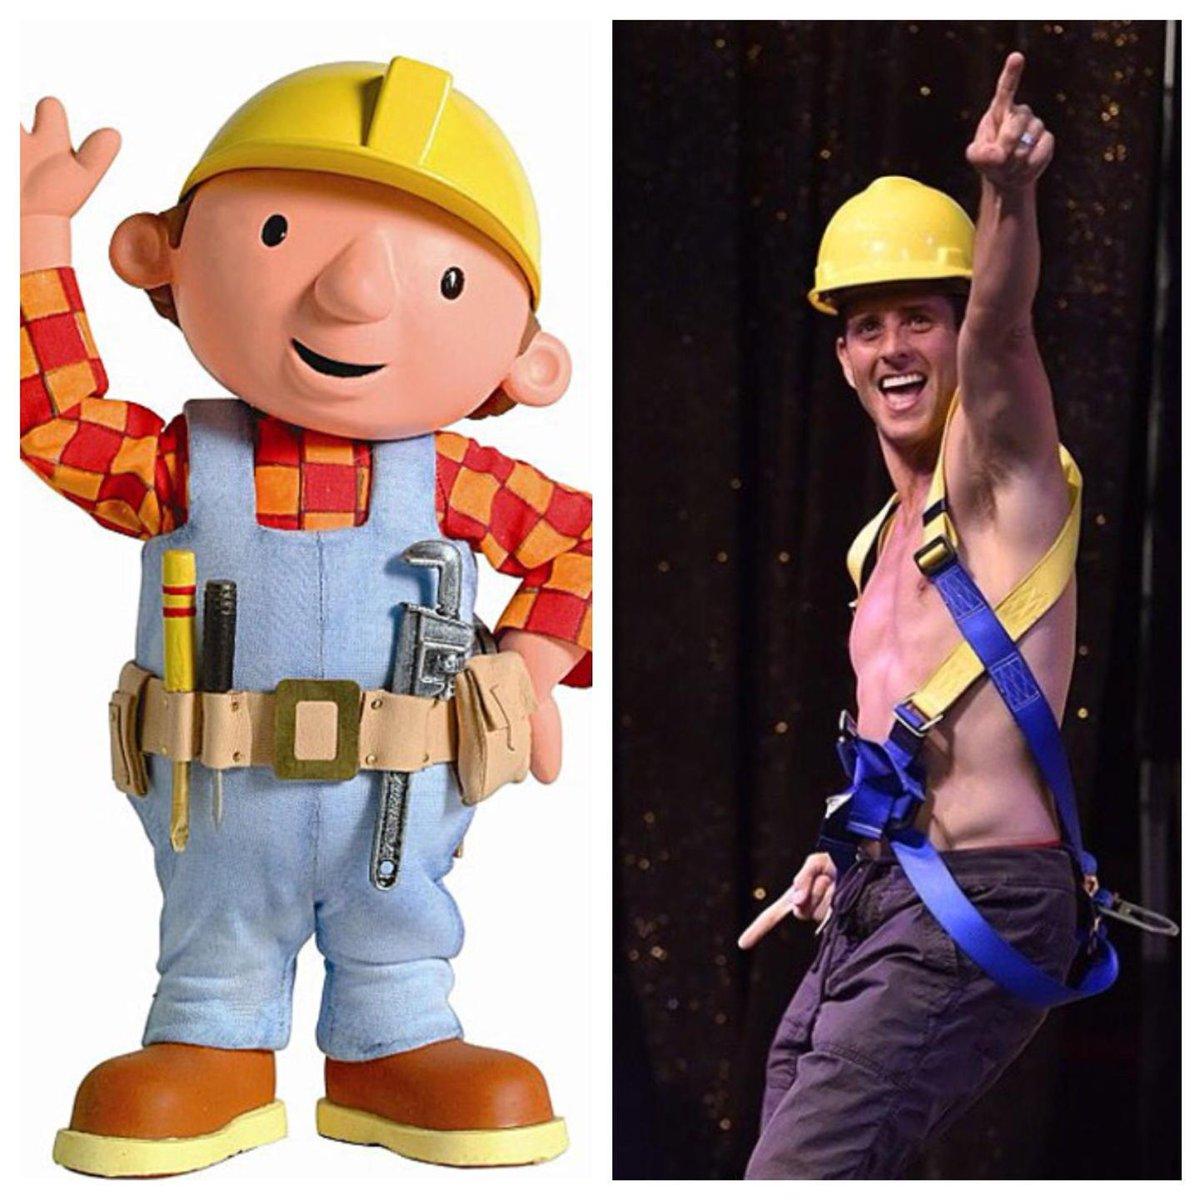 @joeymcintyre Who wore it better? #kidding http://t.co/0aJotAUWMK